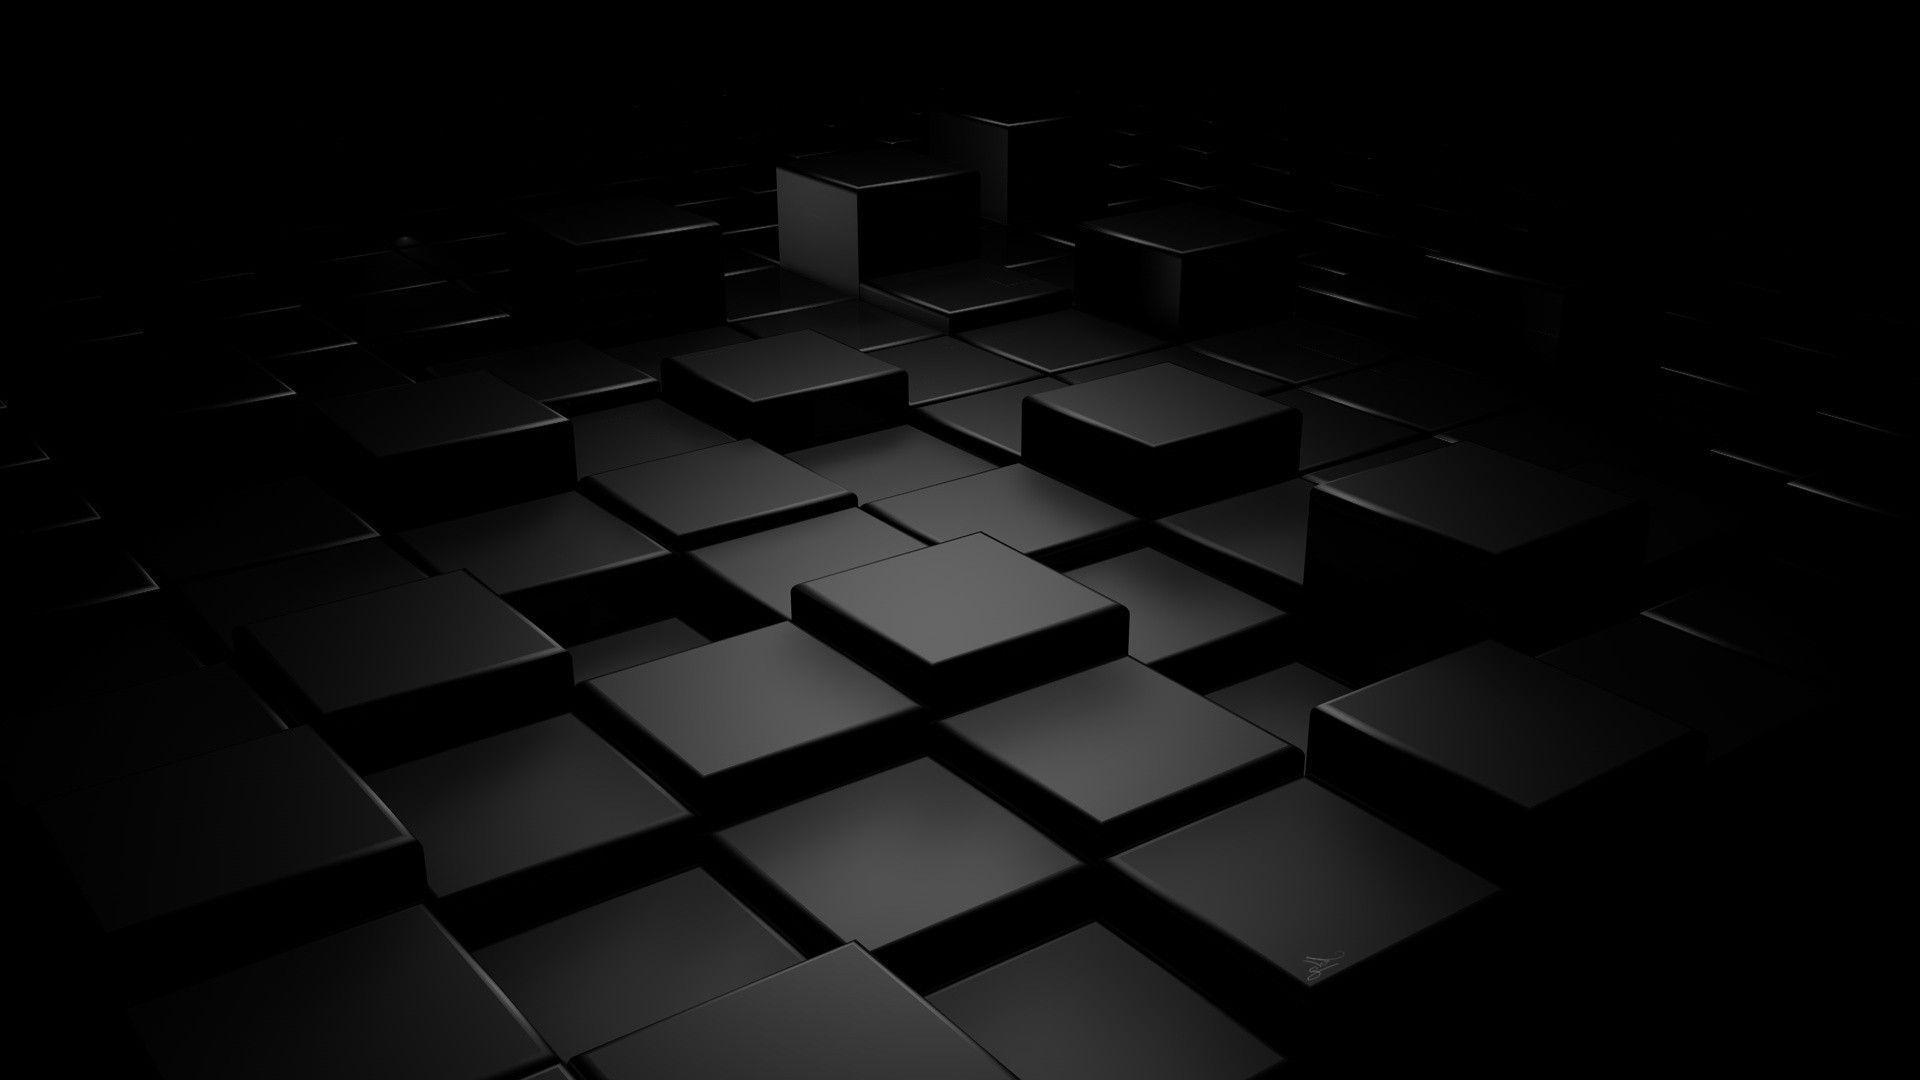 Black 3d Wallpaper 4k